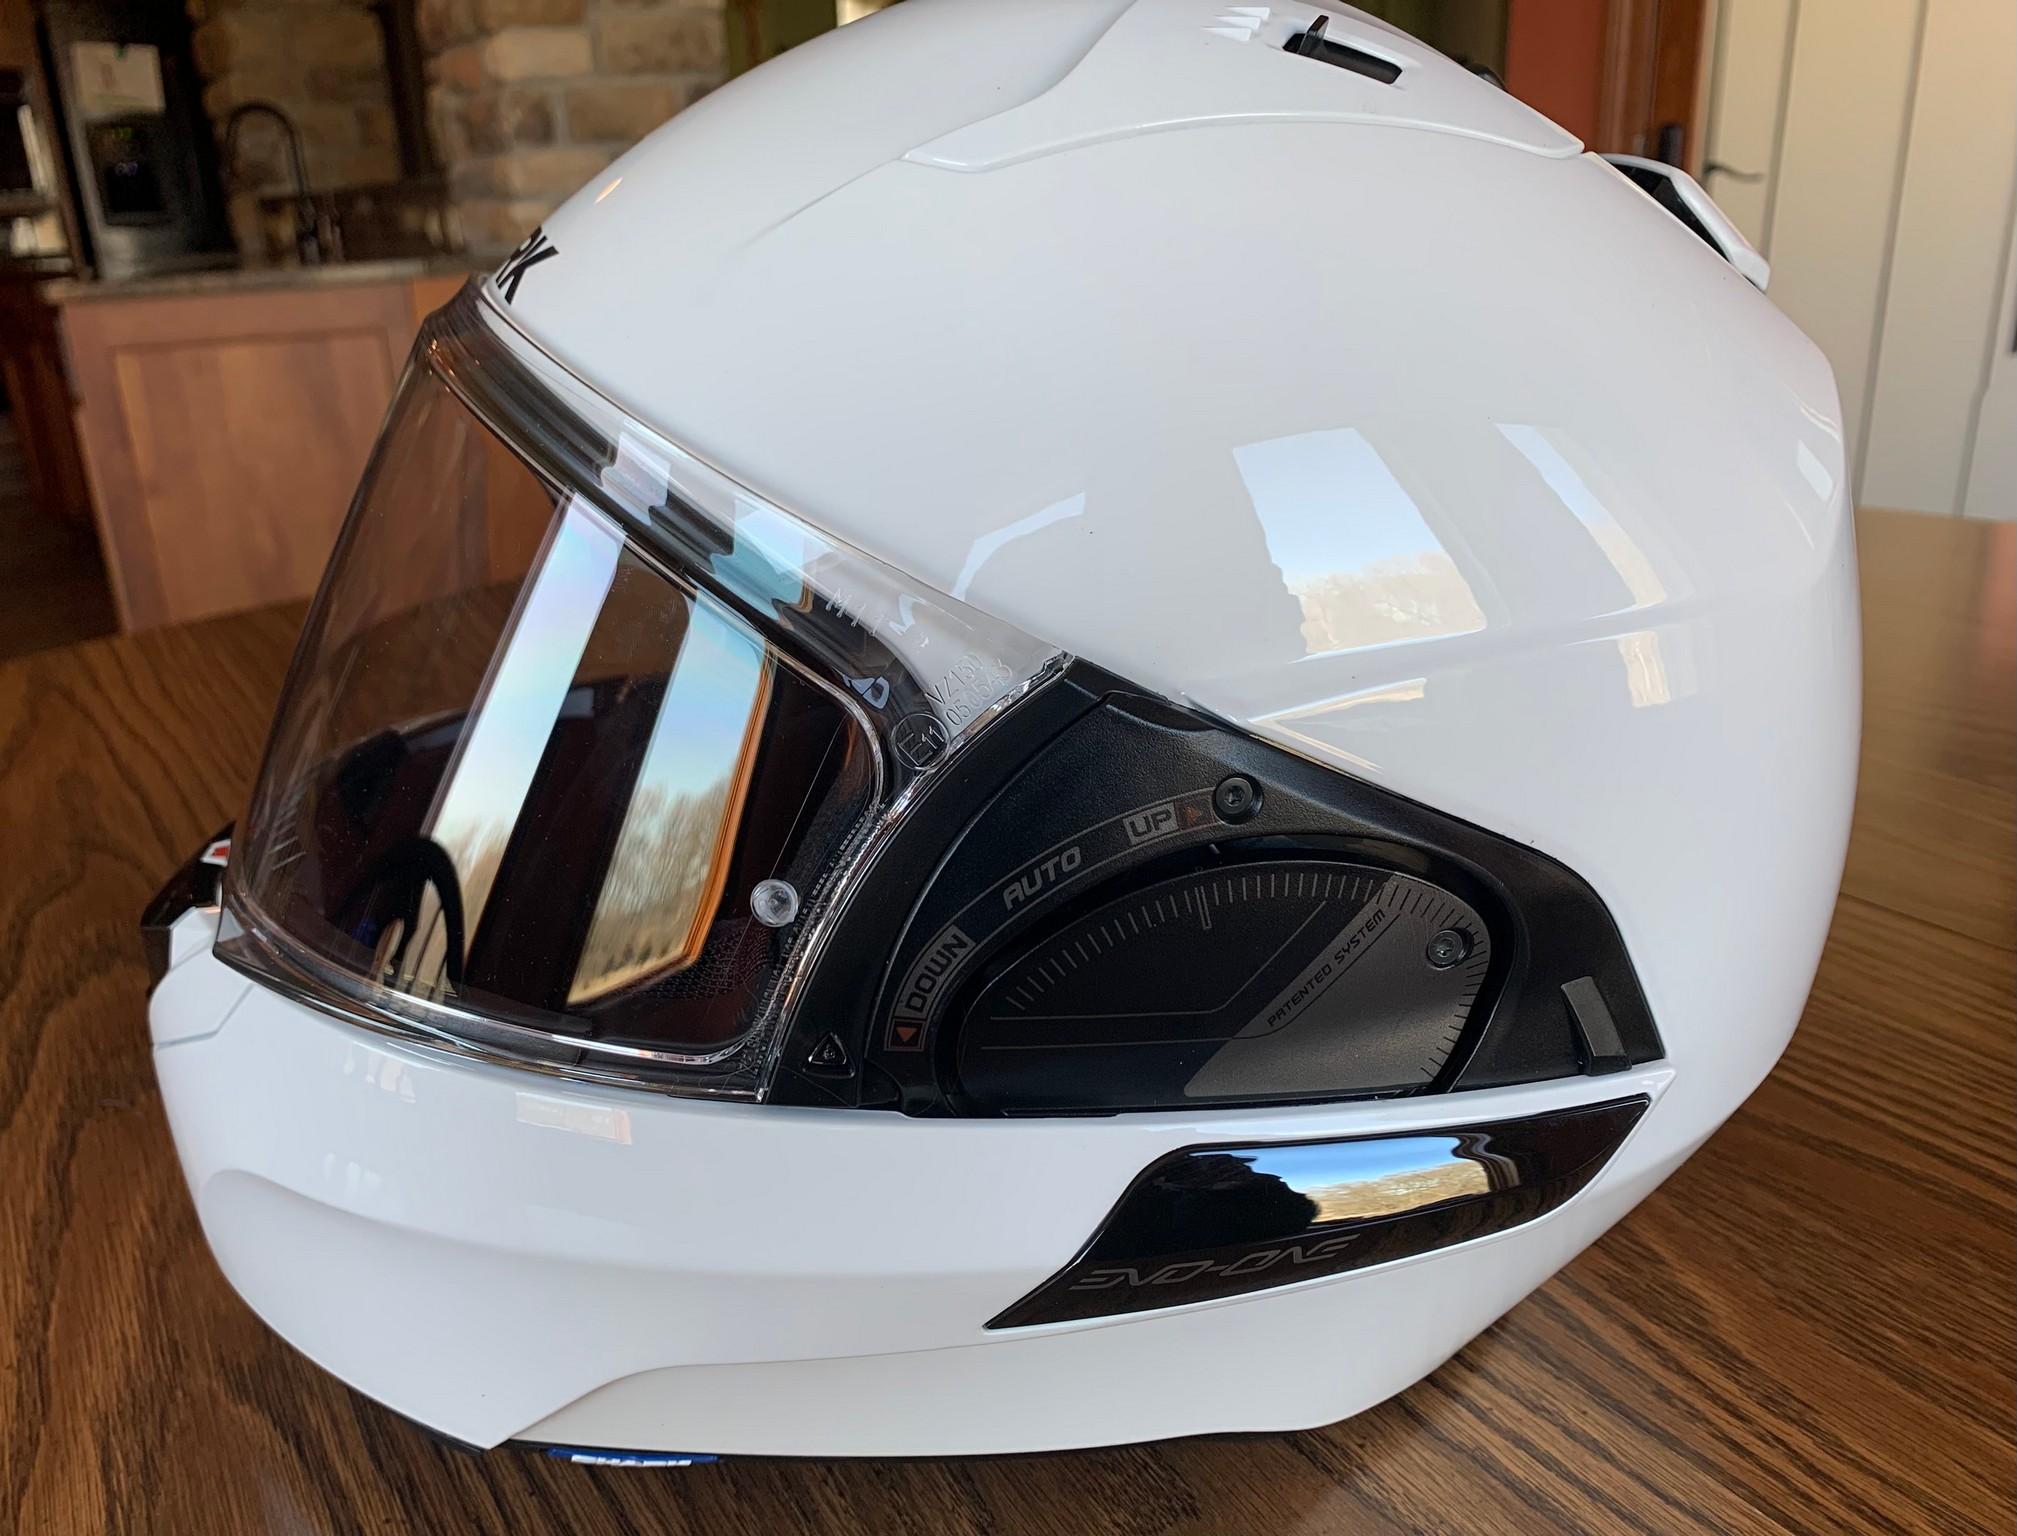 Side view of the Shark EVO One 2 helmet